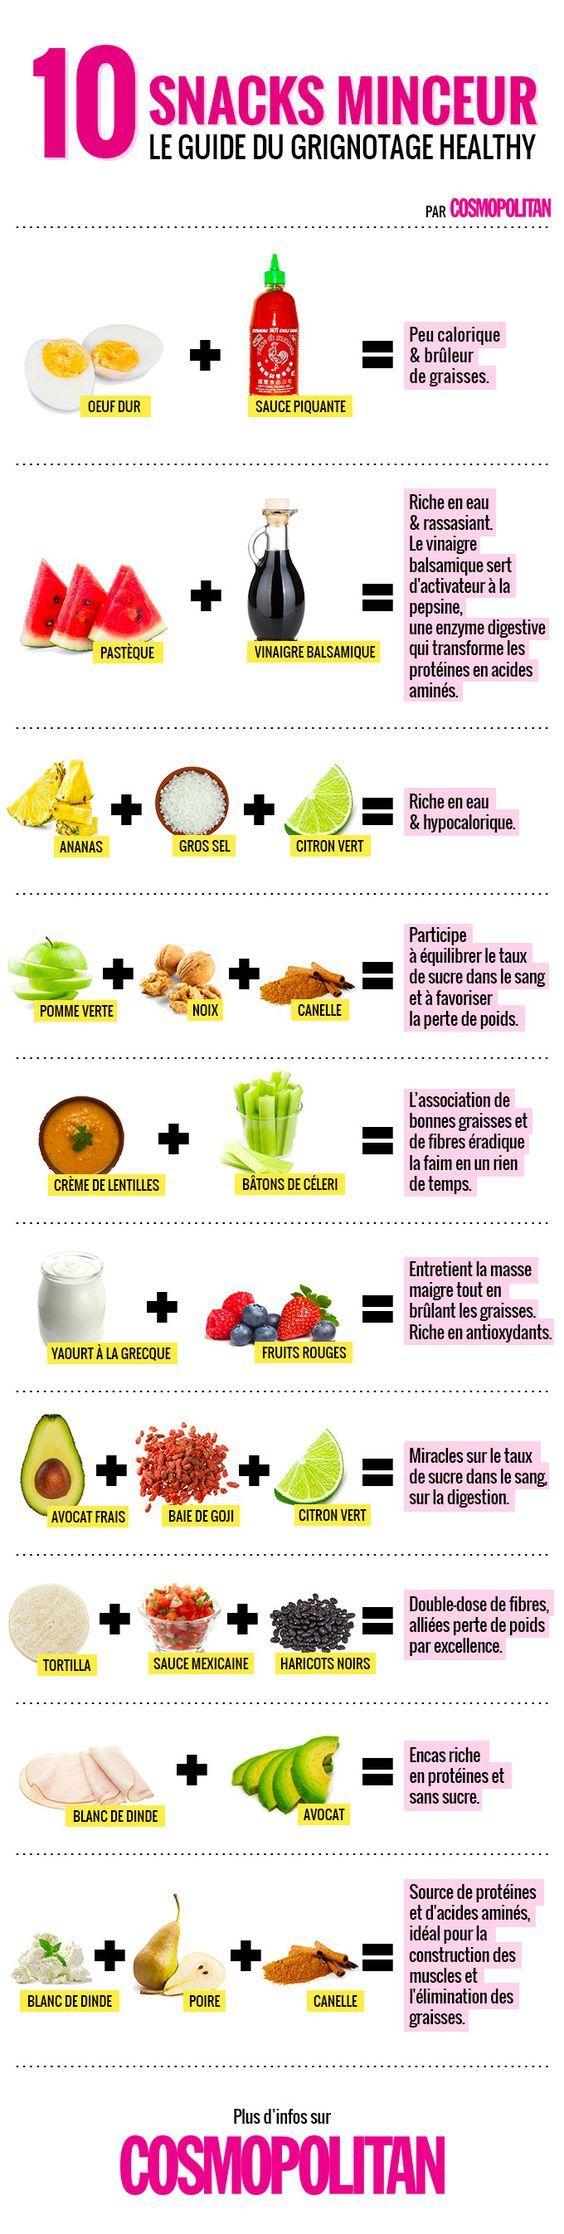 25 snacks gourmands qui aident à perdre du poids